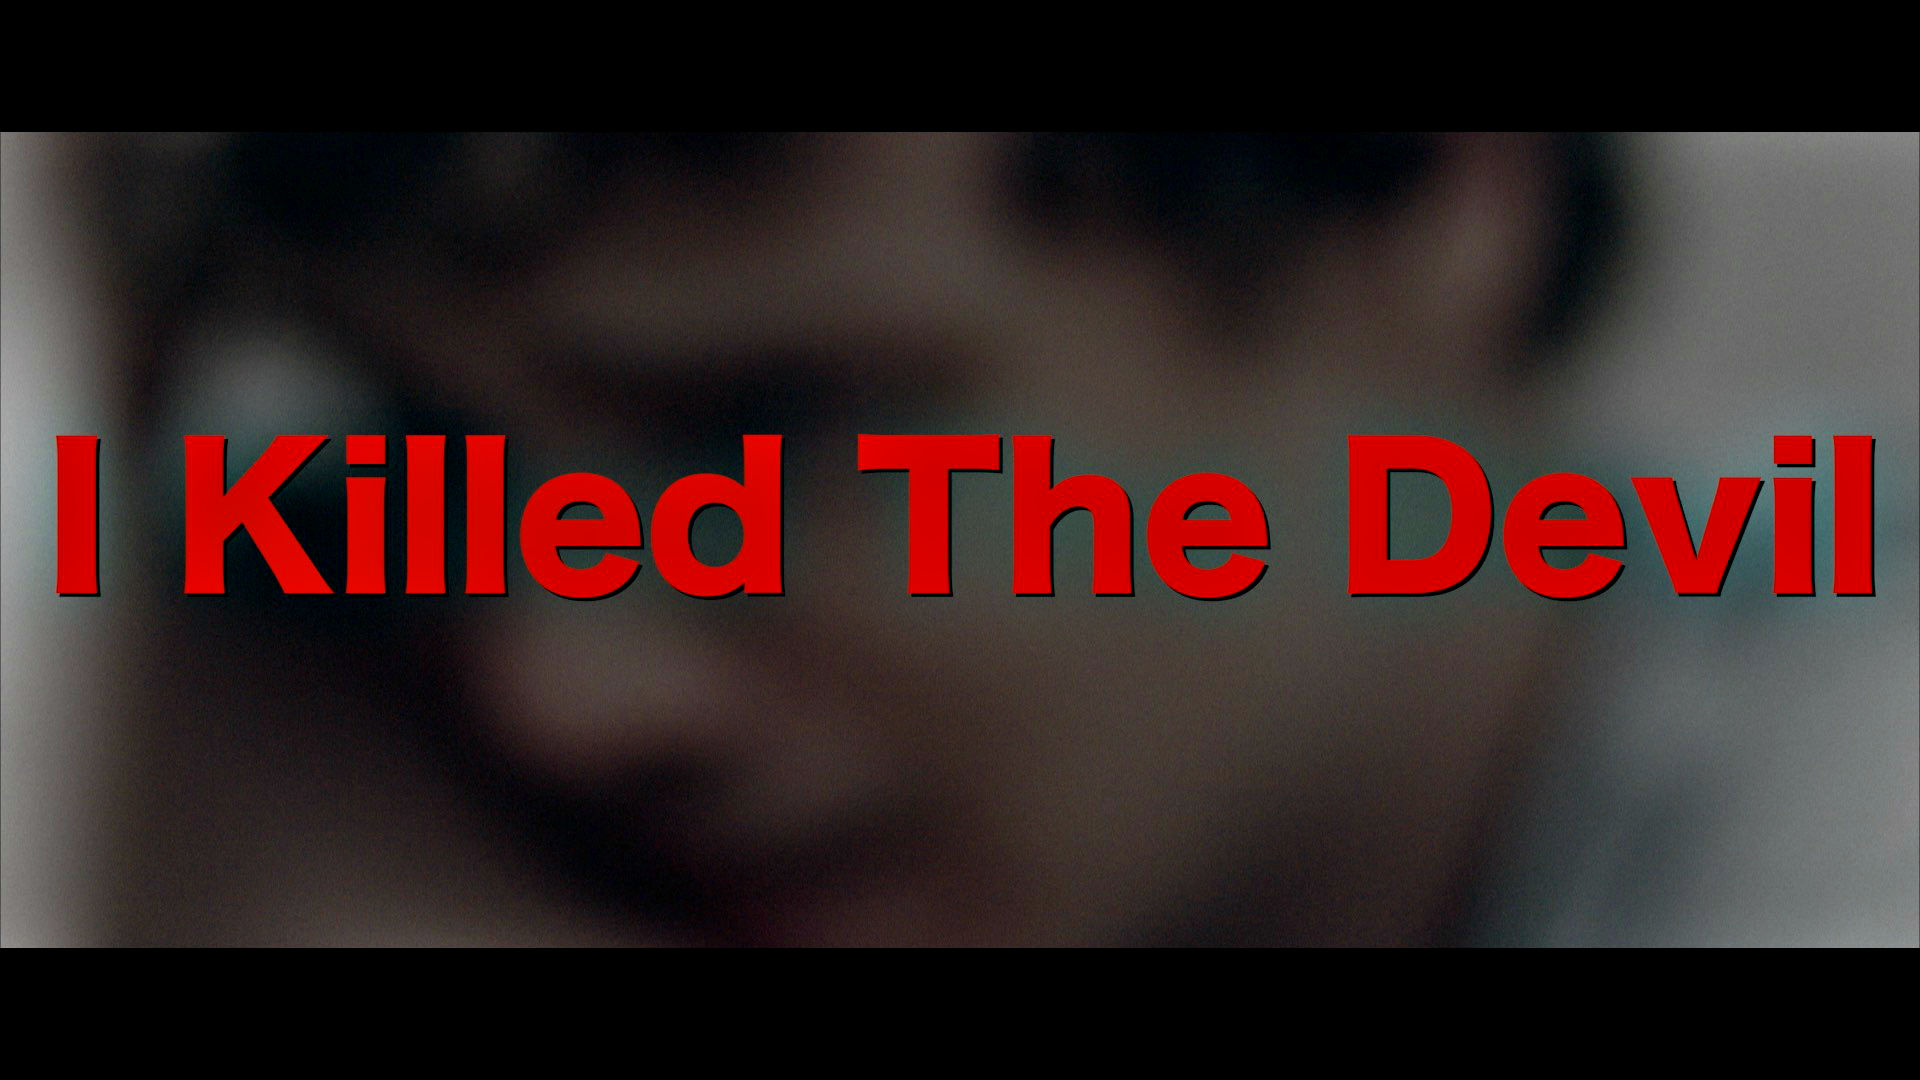 I Killed The Devil